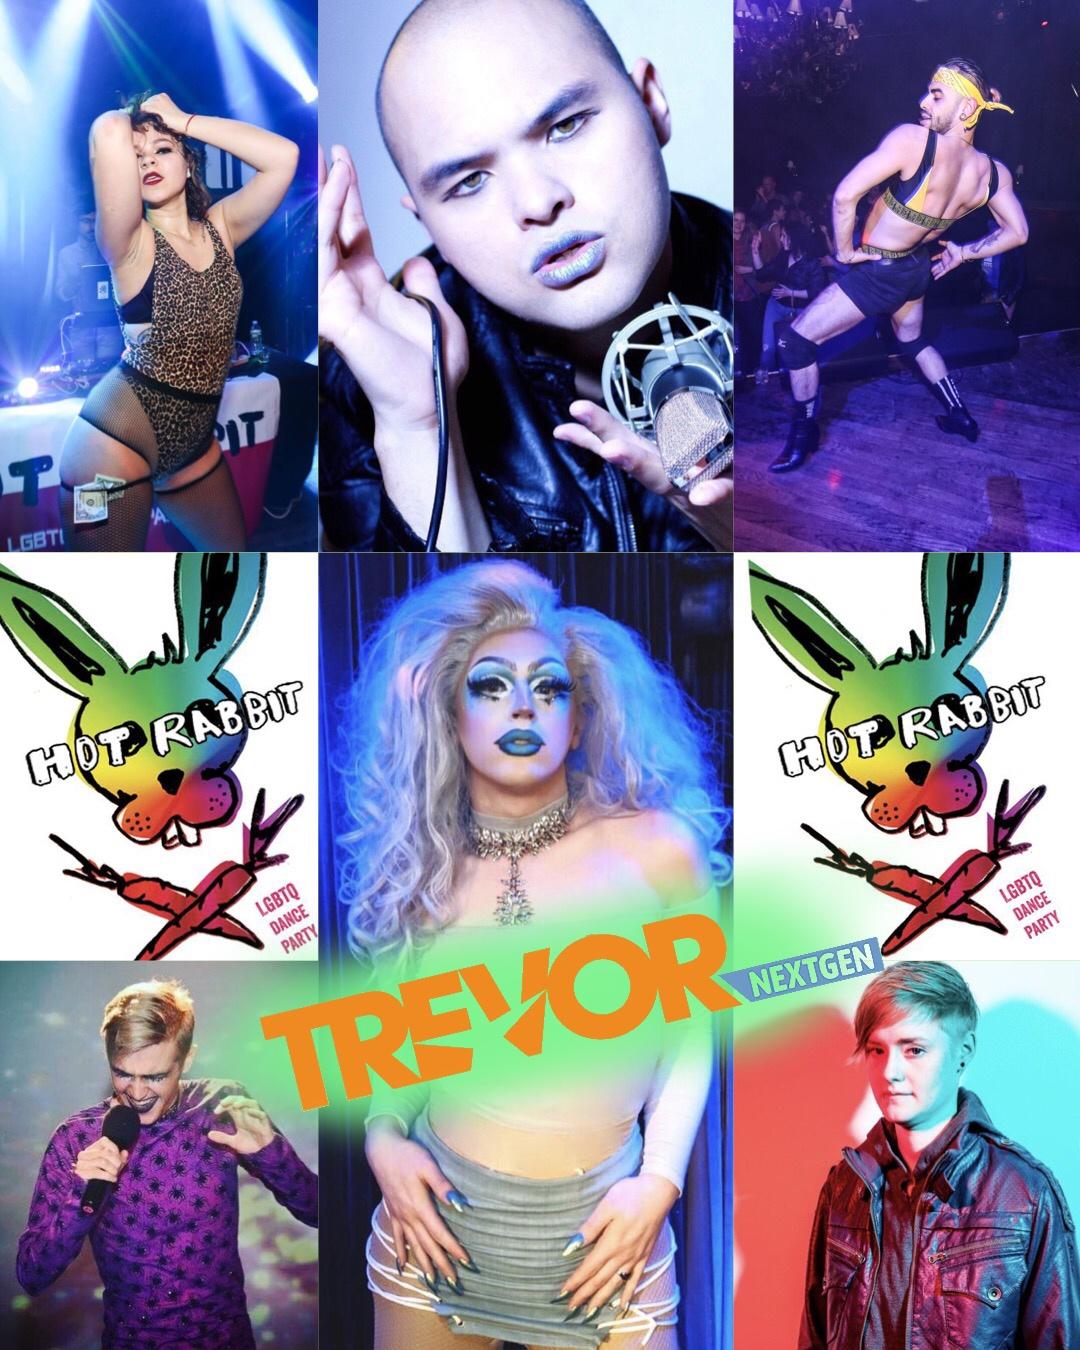 Hot Rabbit Trevor Project Benefit